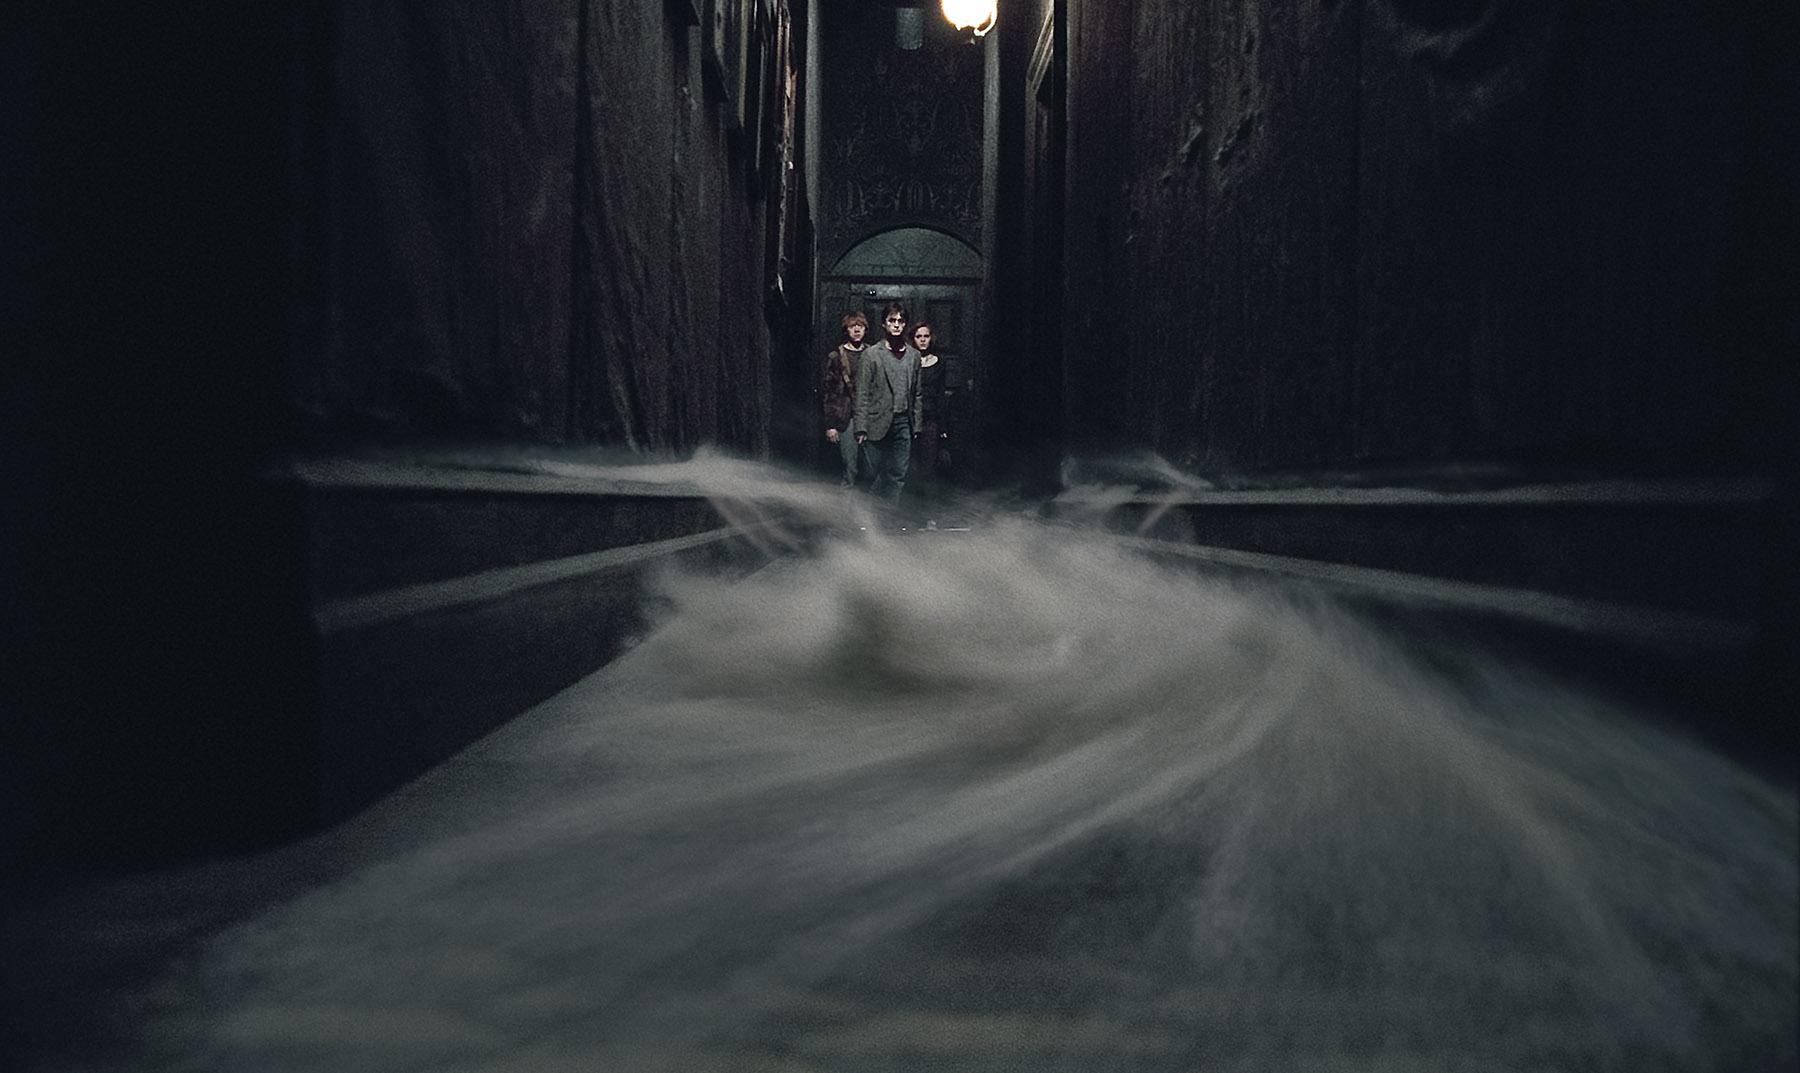 Creepy Hallway from Harry Potter Deathly Hallows Desktop